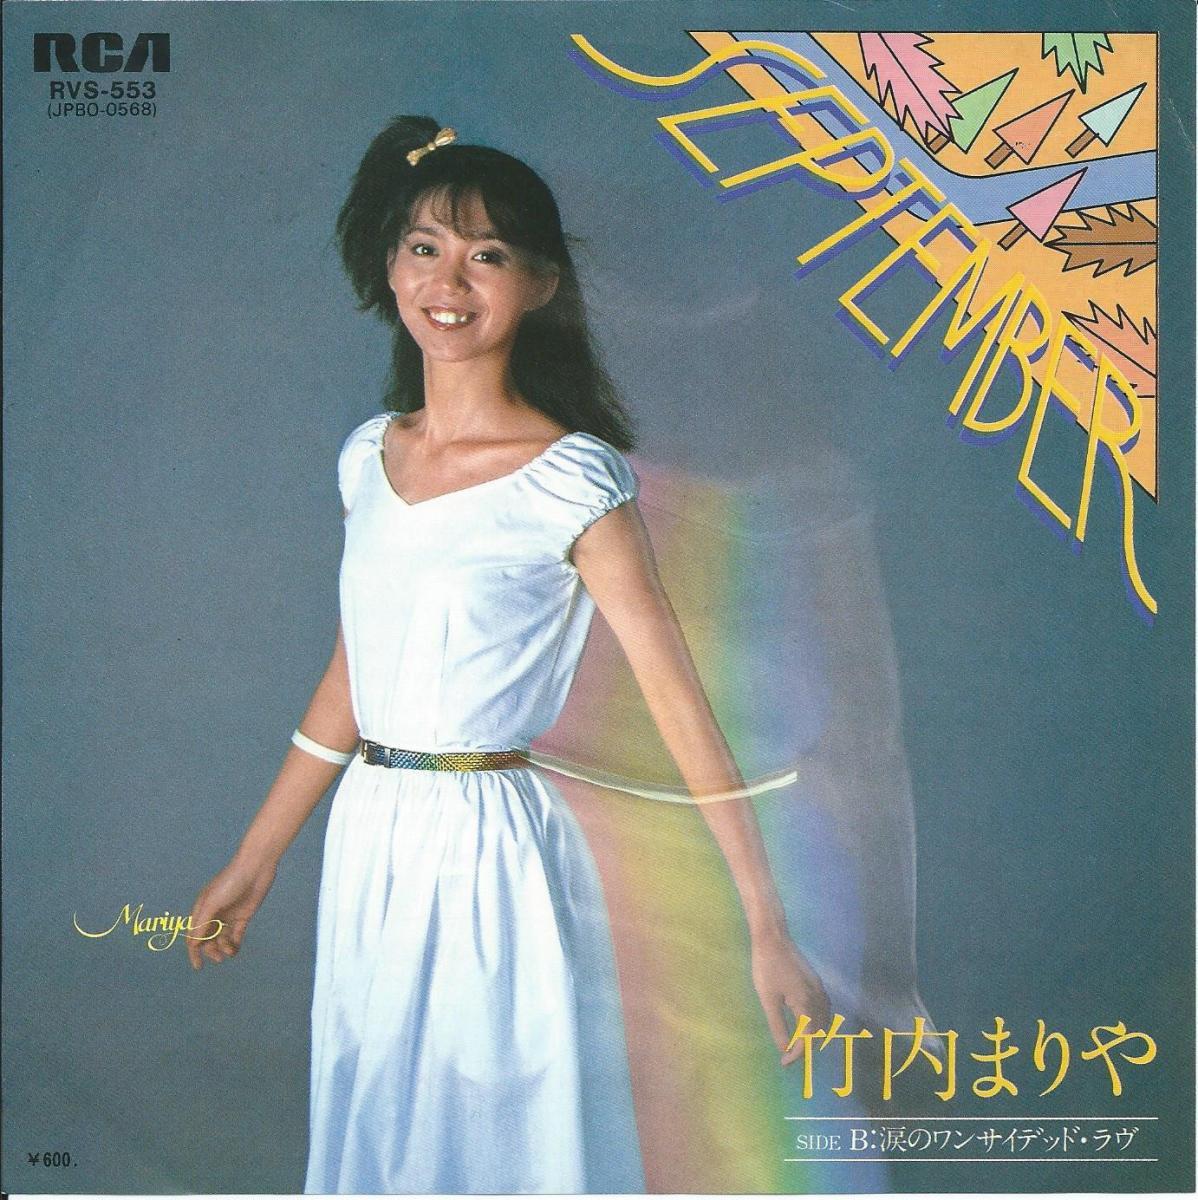 Mariya Takeuchi - Love Songs